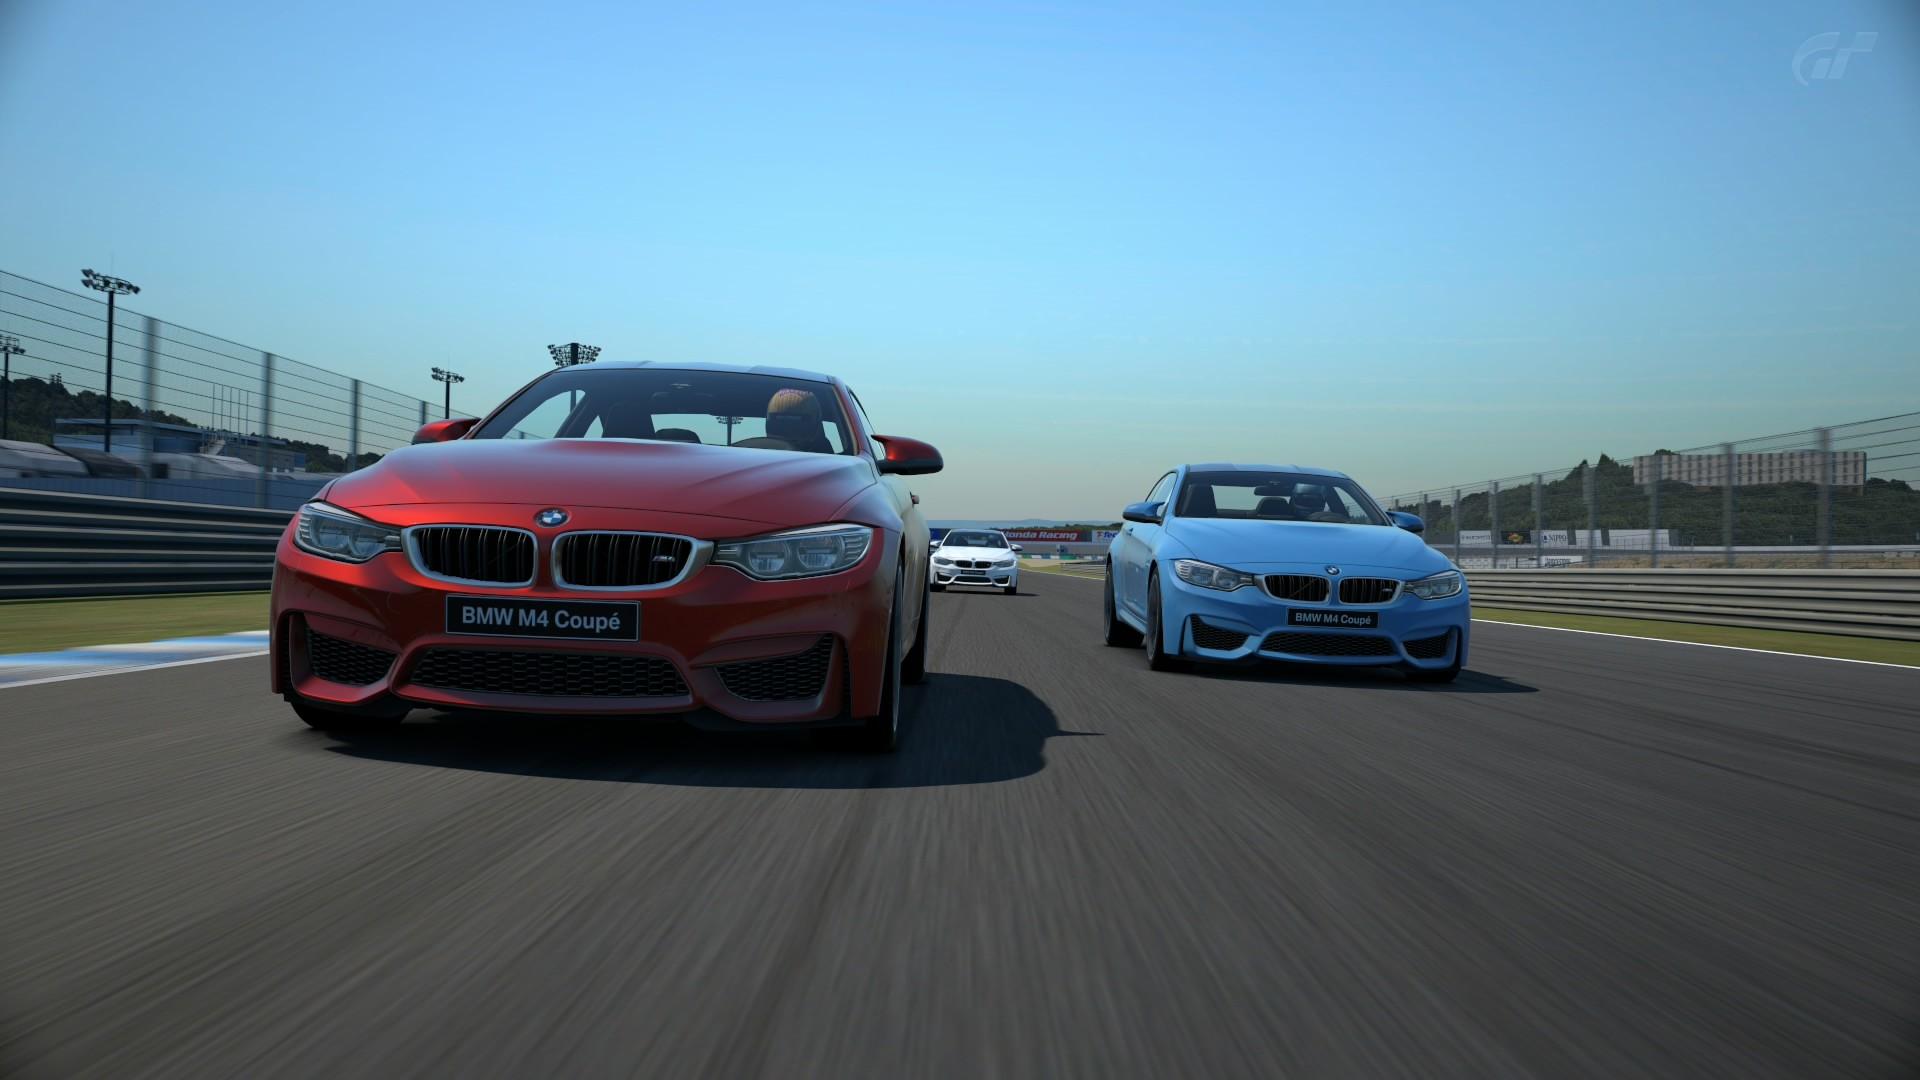 Crónica del BMW M4 Coupé en Motegi Twin_r16